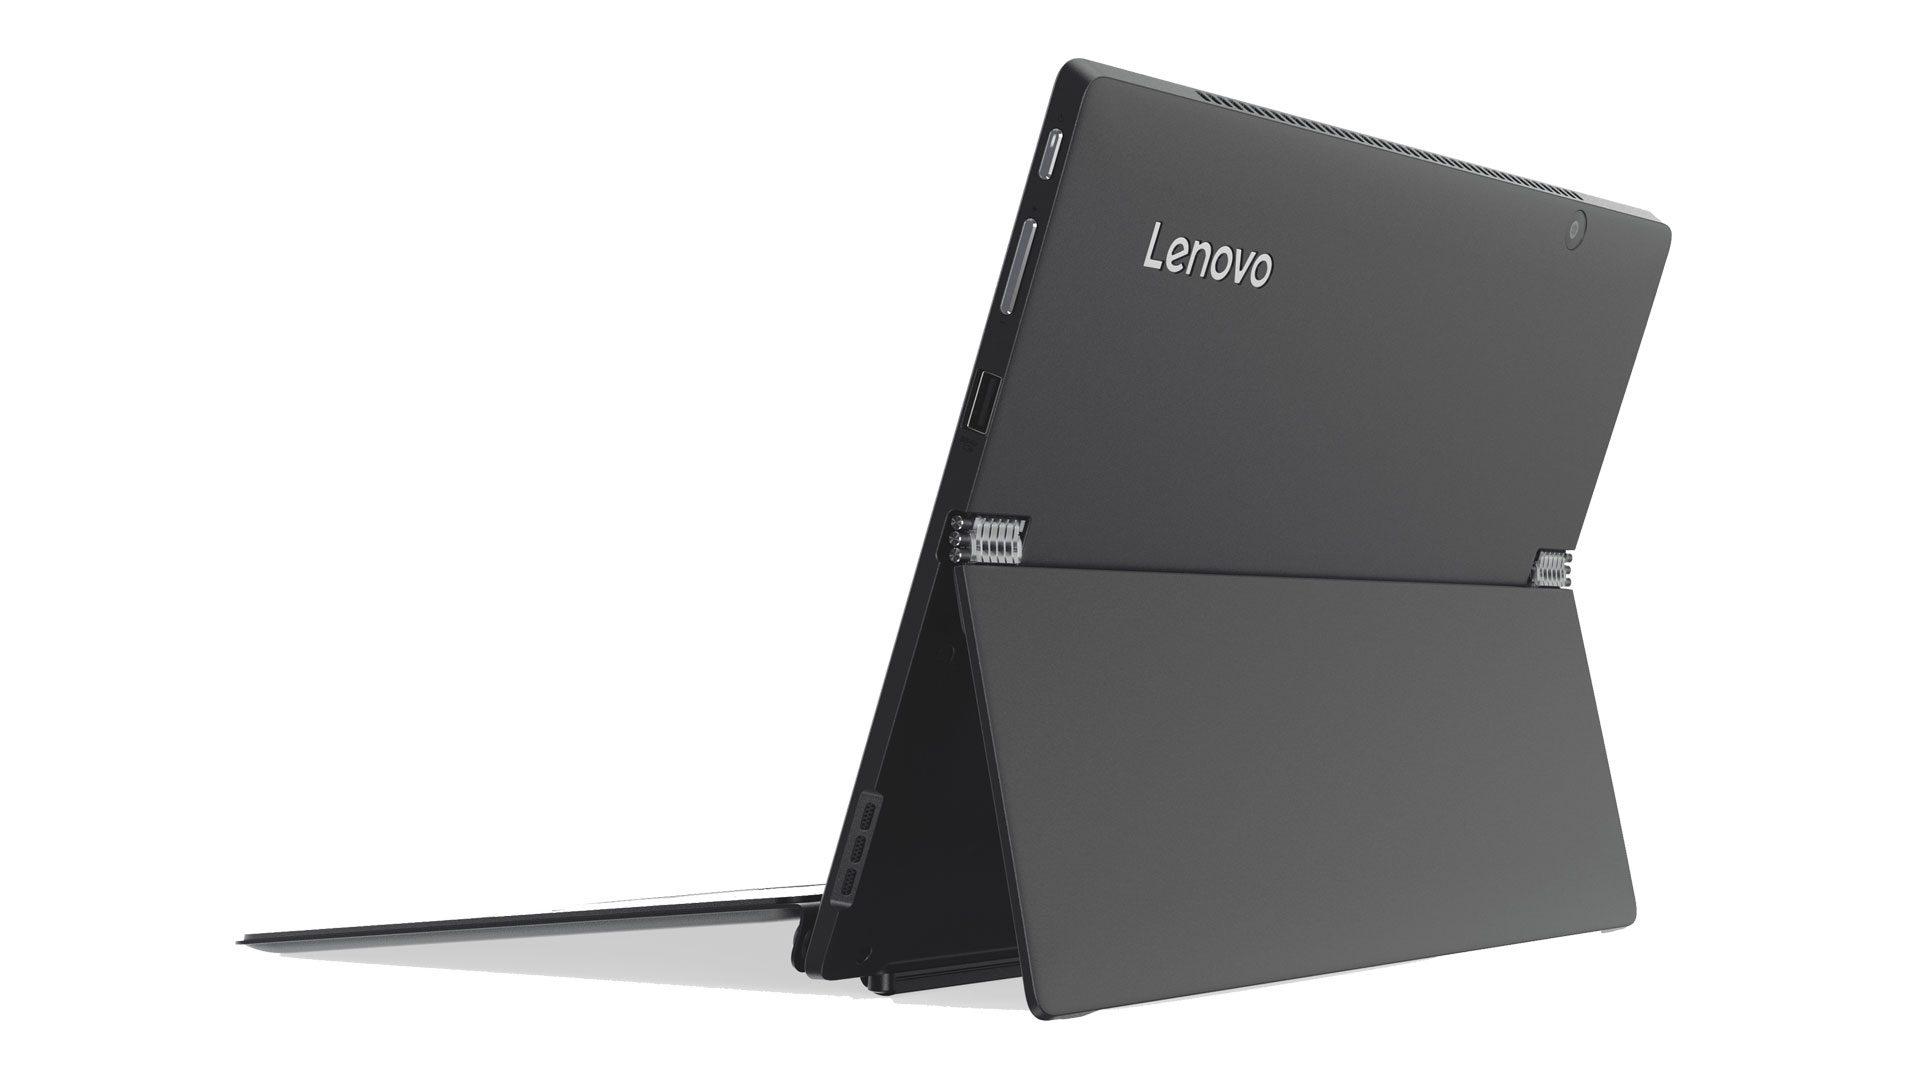 Lenovo-MIIX-720-12IKB_Ansicht-4